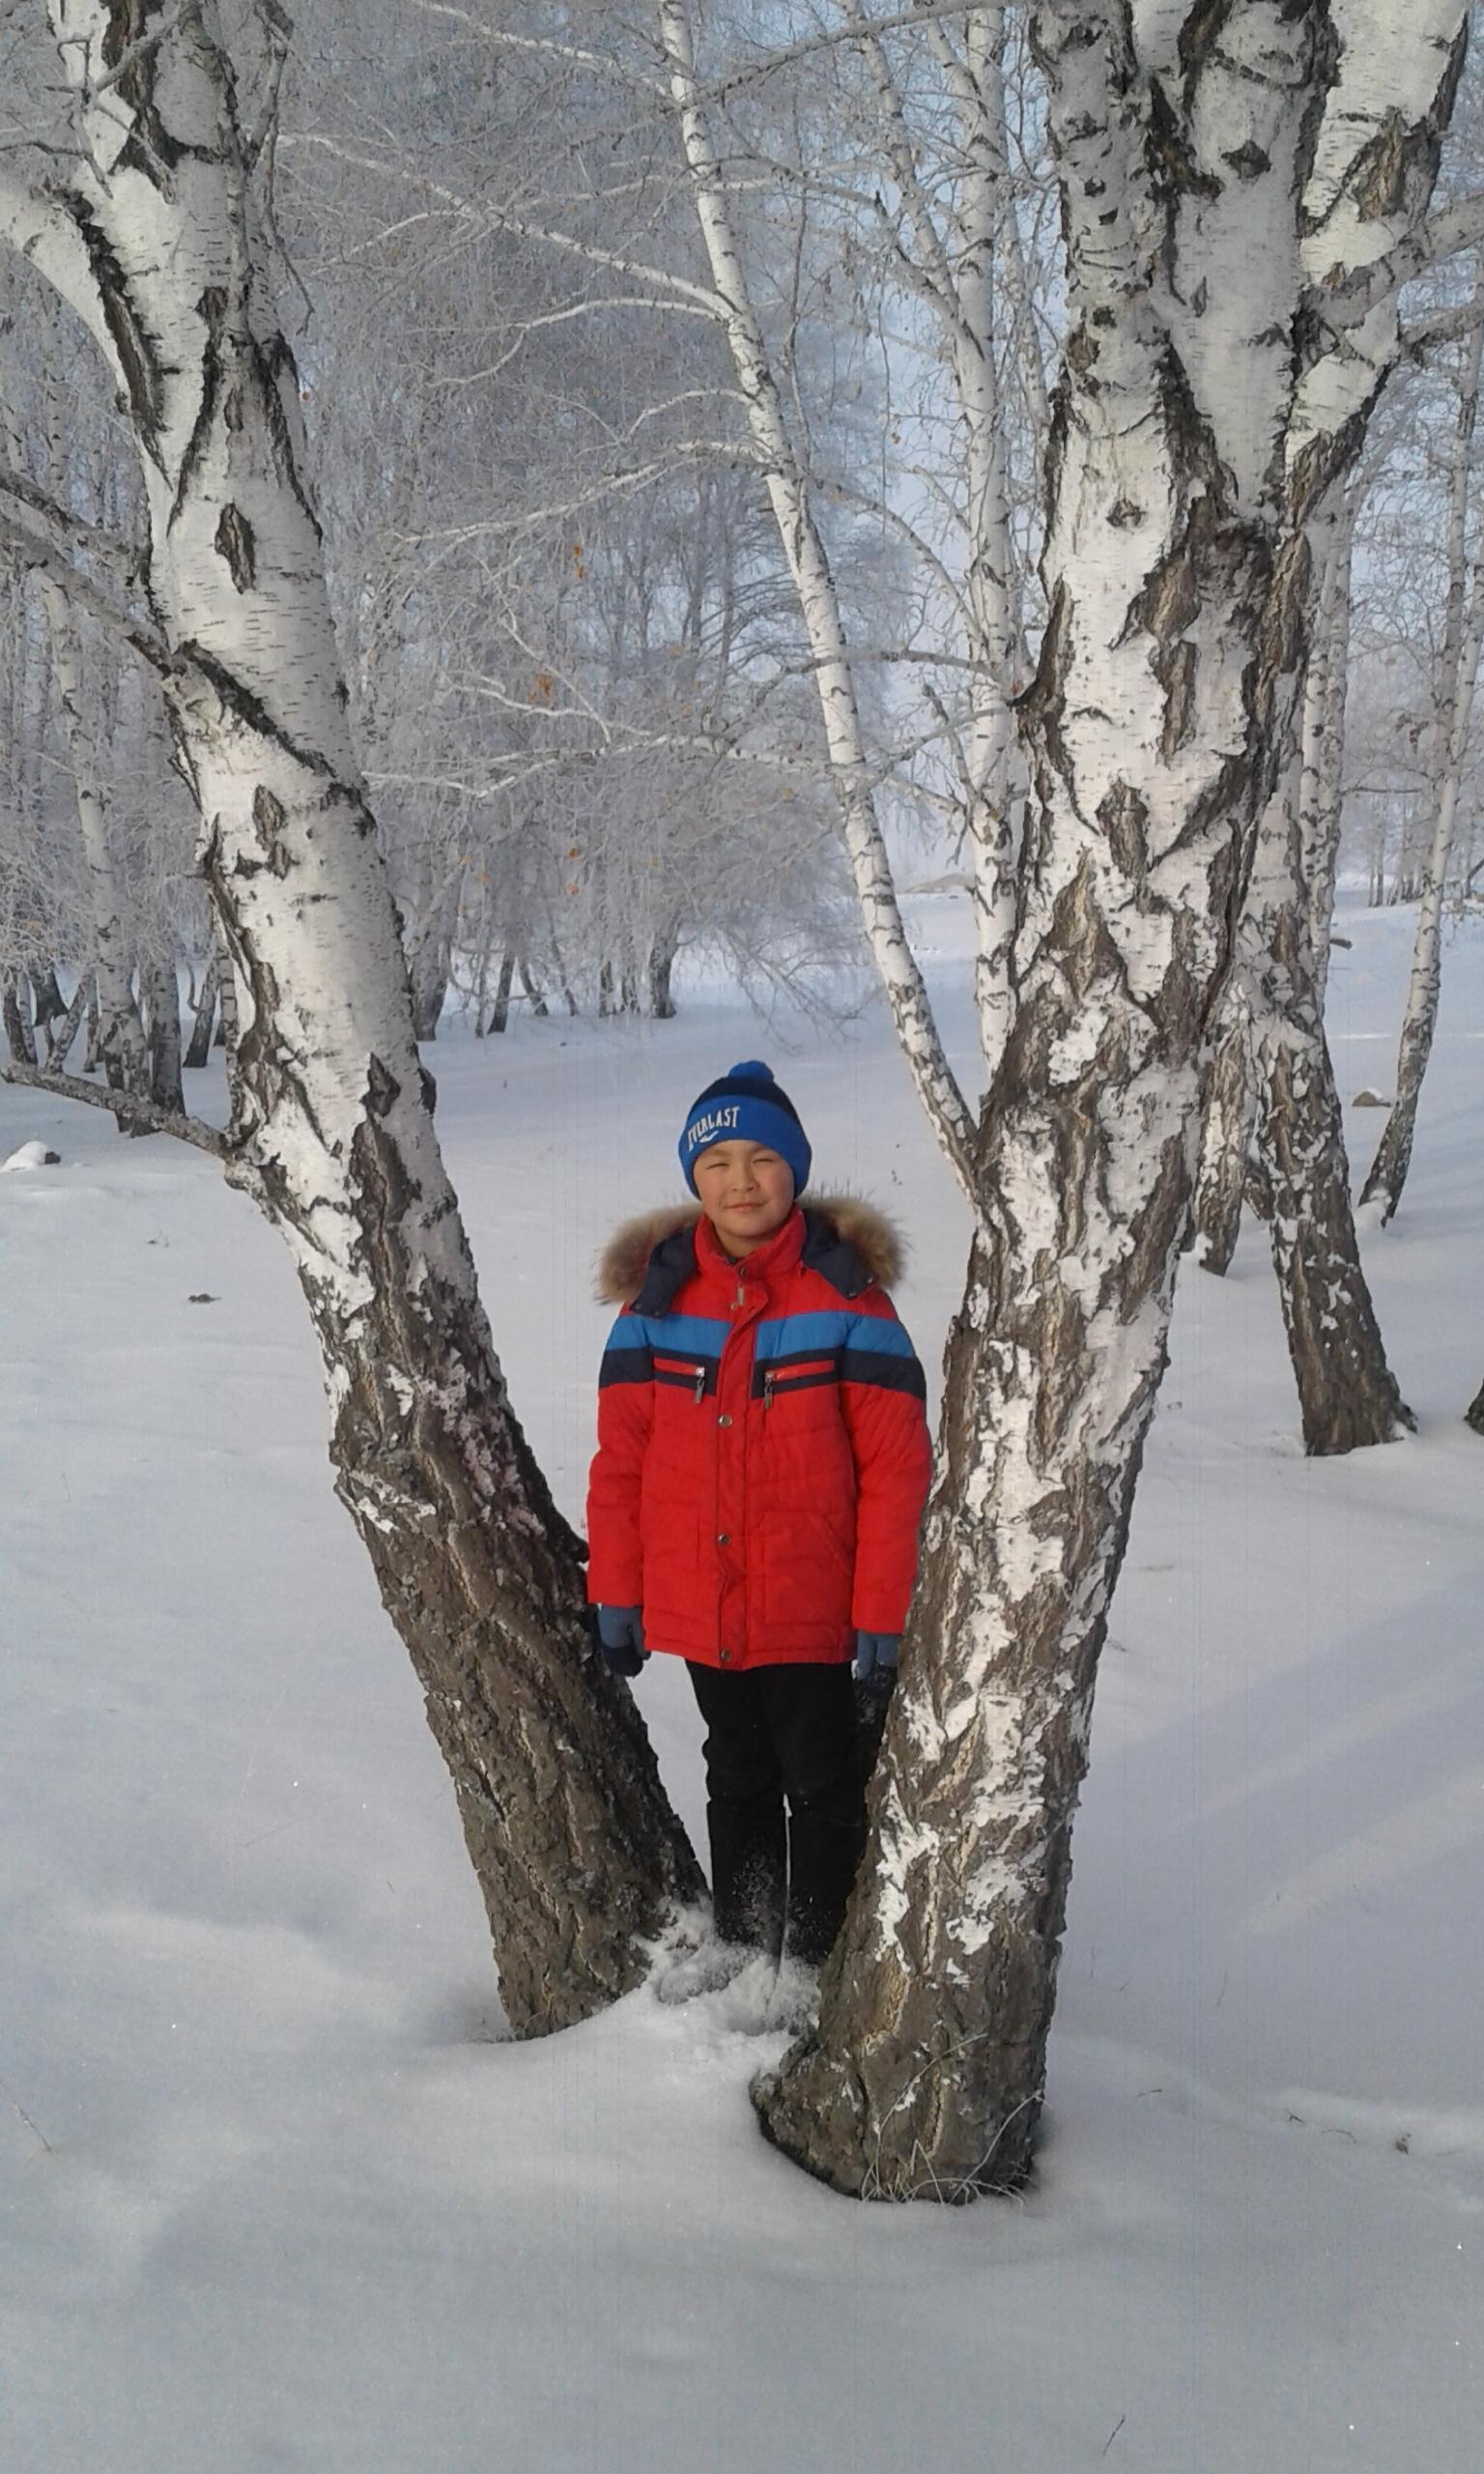 Снежное царство и я.. Зимний образ